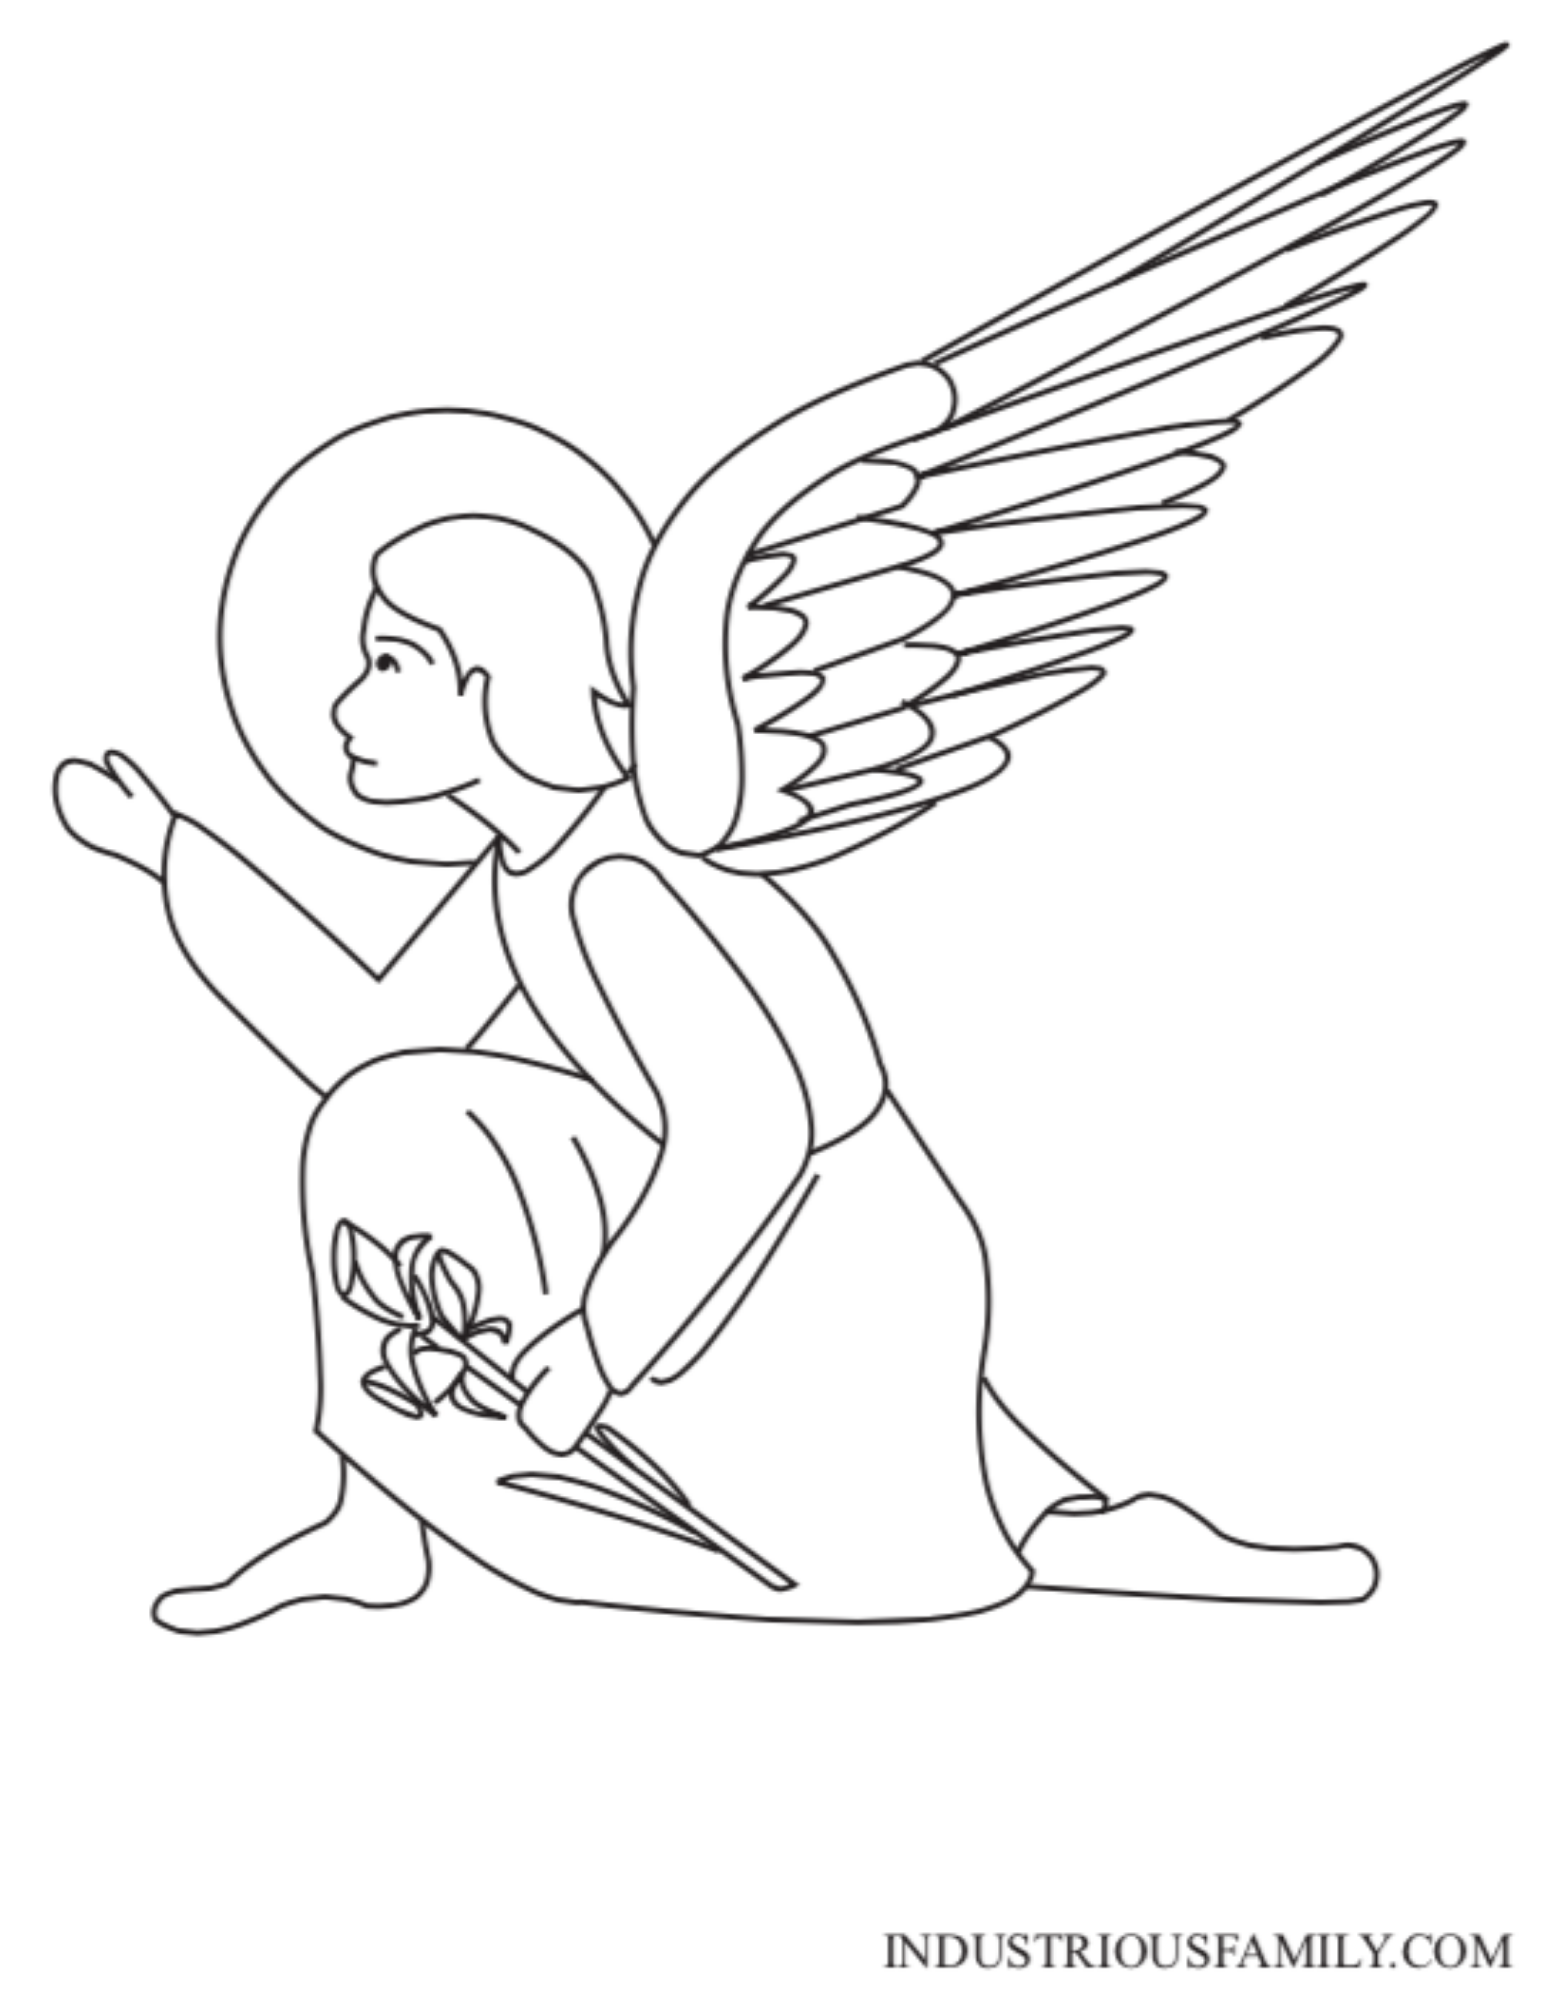 St. Gabriel Coloring Page